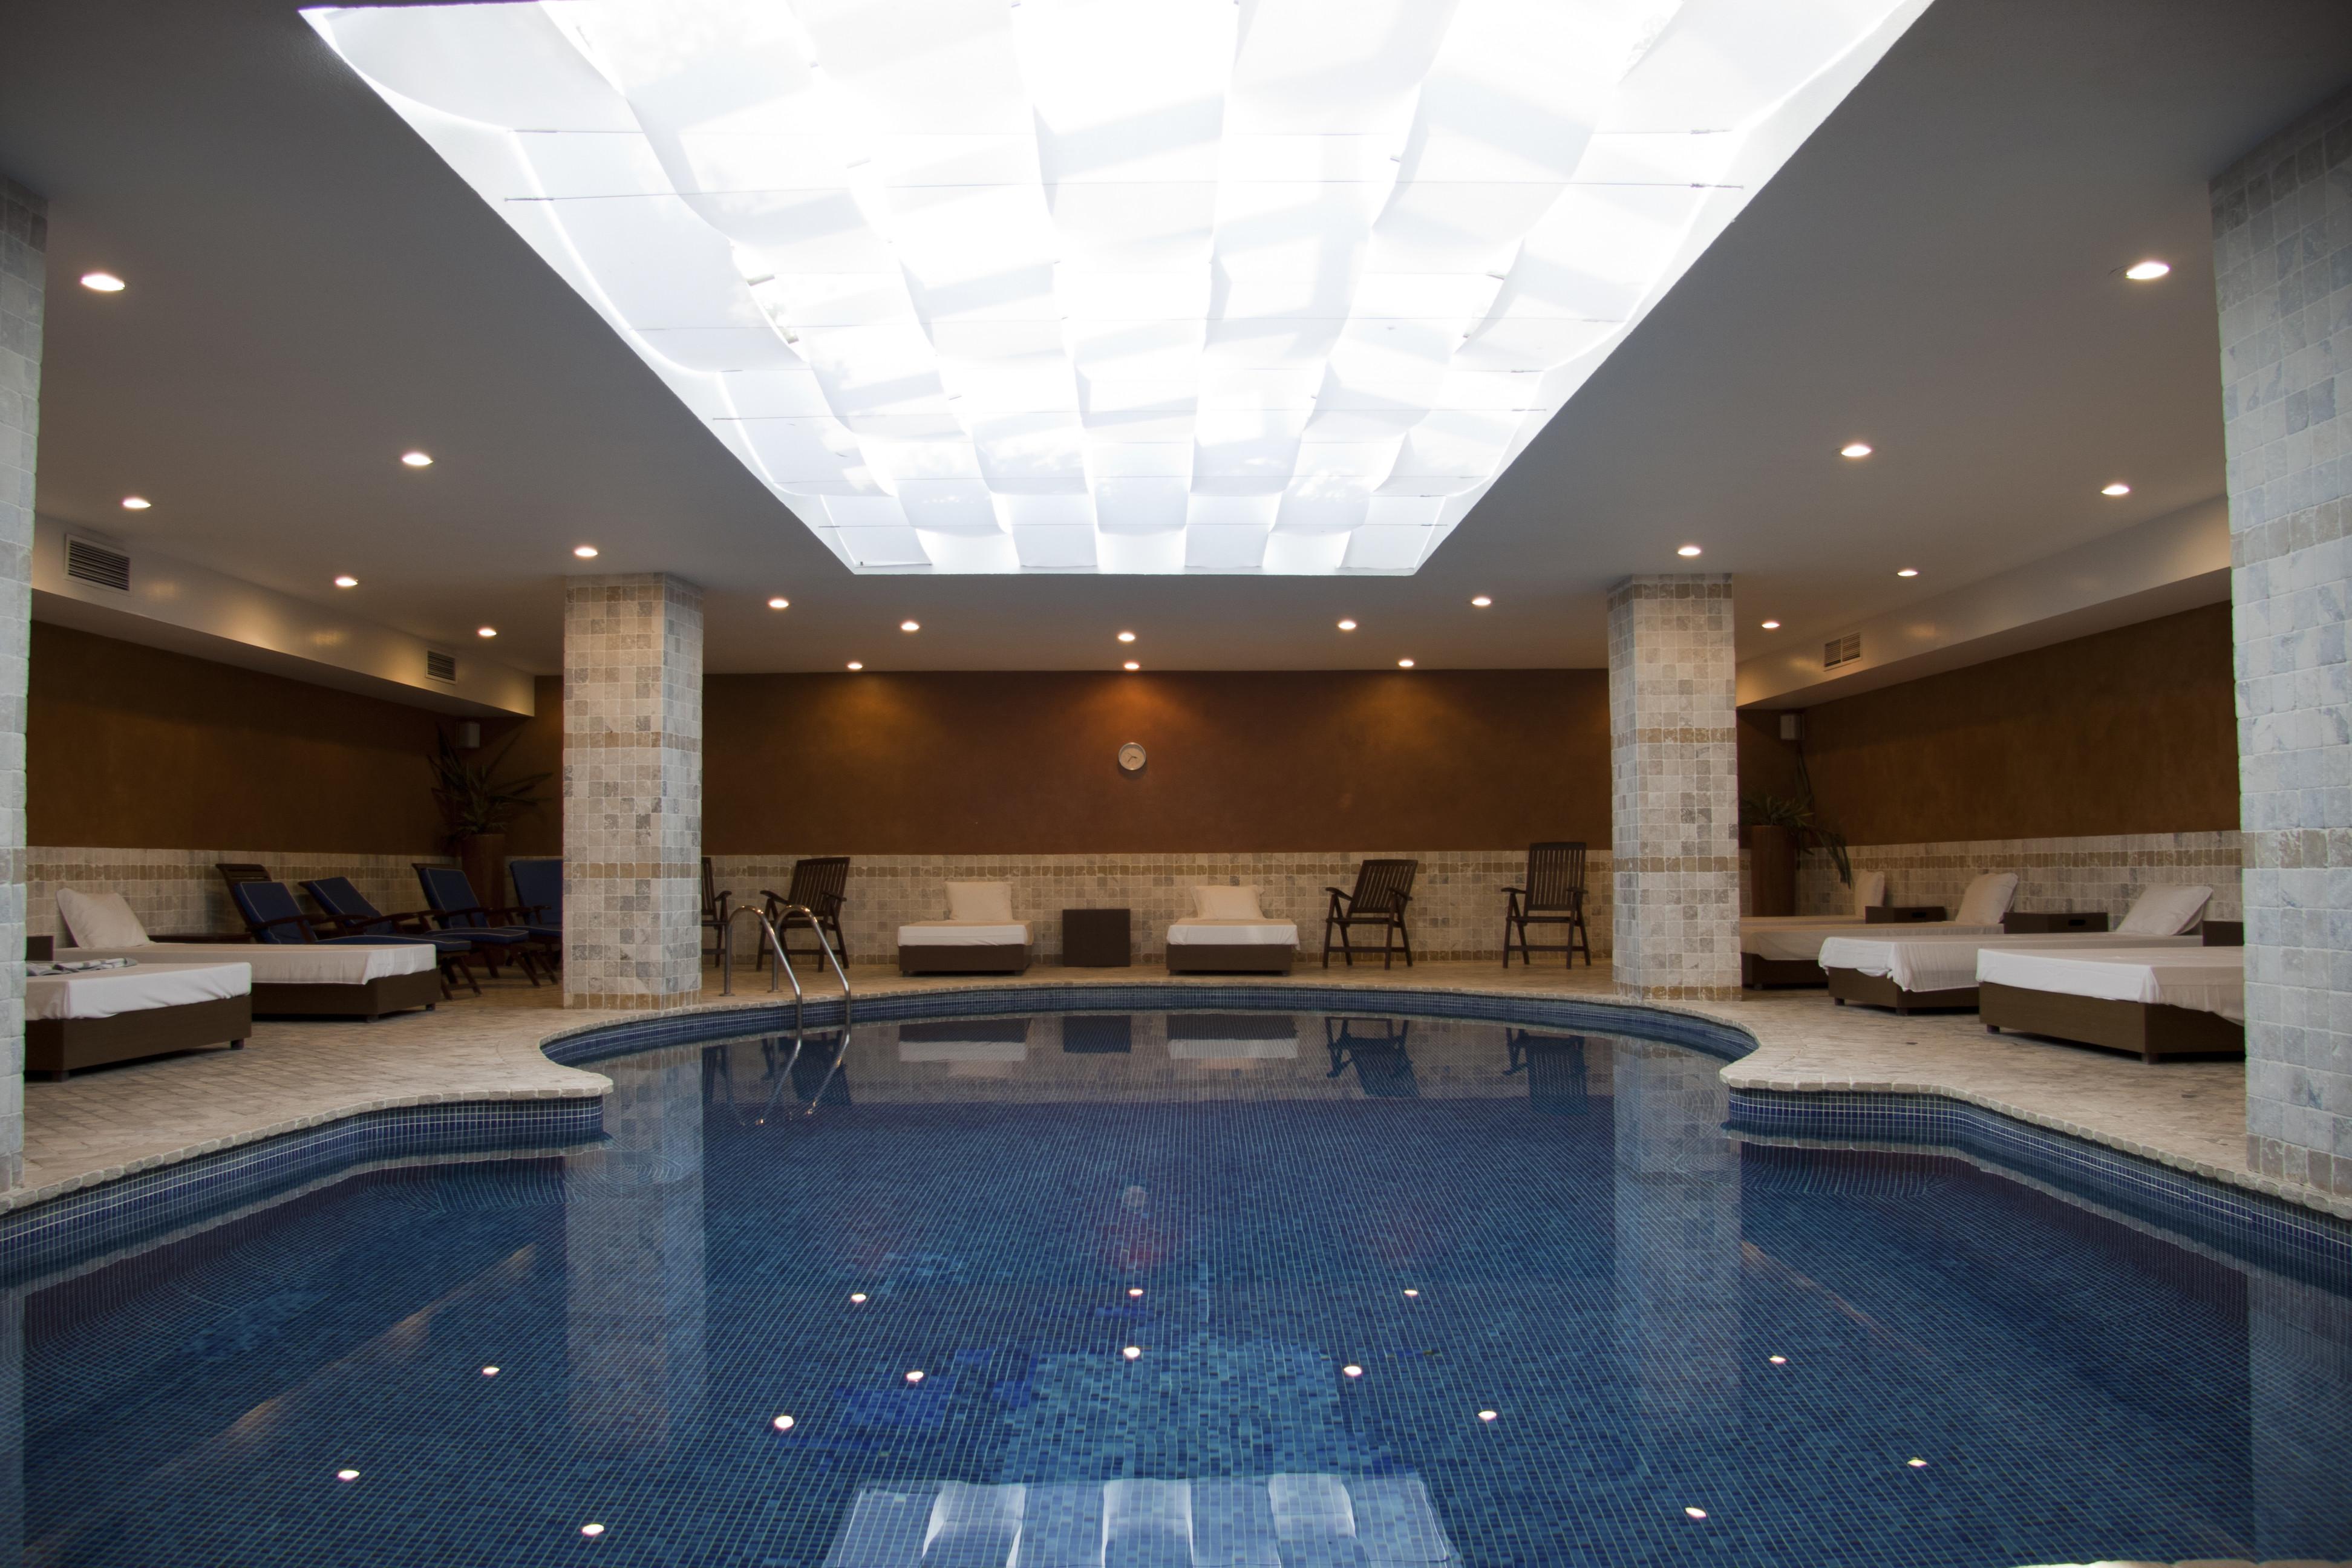 De Meest Relaxe Hotels